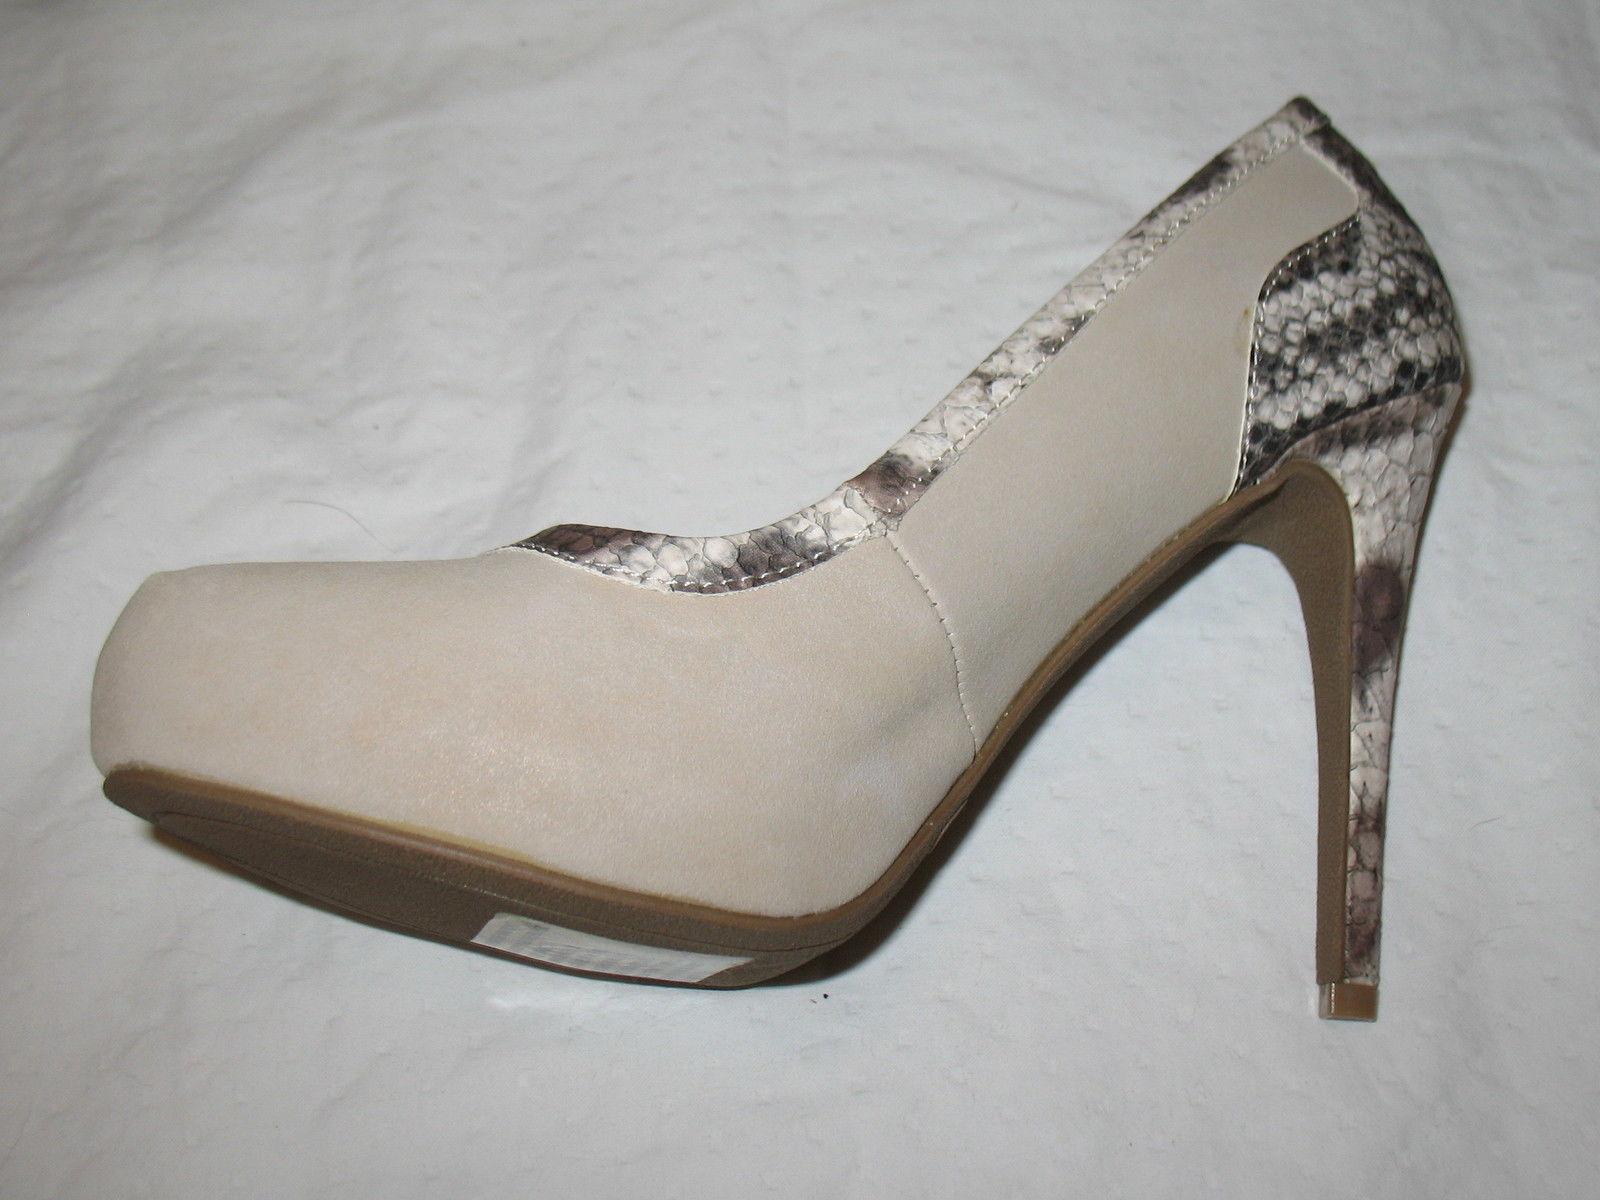 Forever Paula Abdul Size 8 Exotic Print Pump New High Heel Beige Avon Club Style image 3